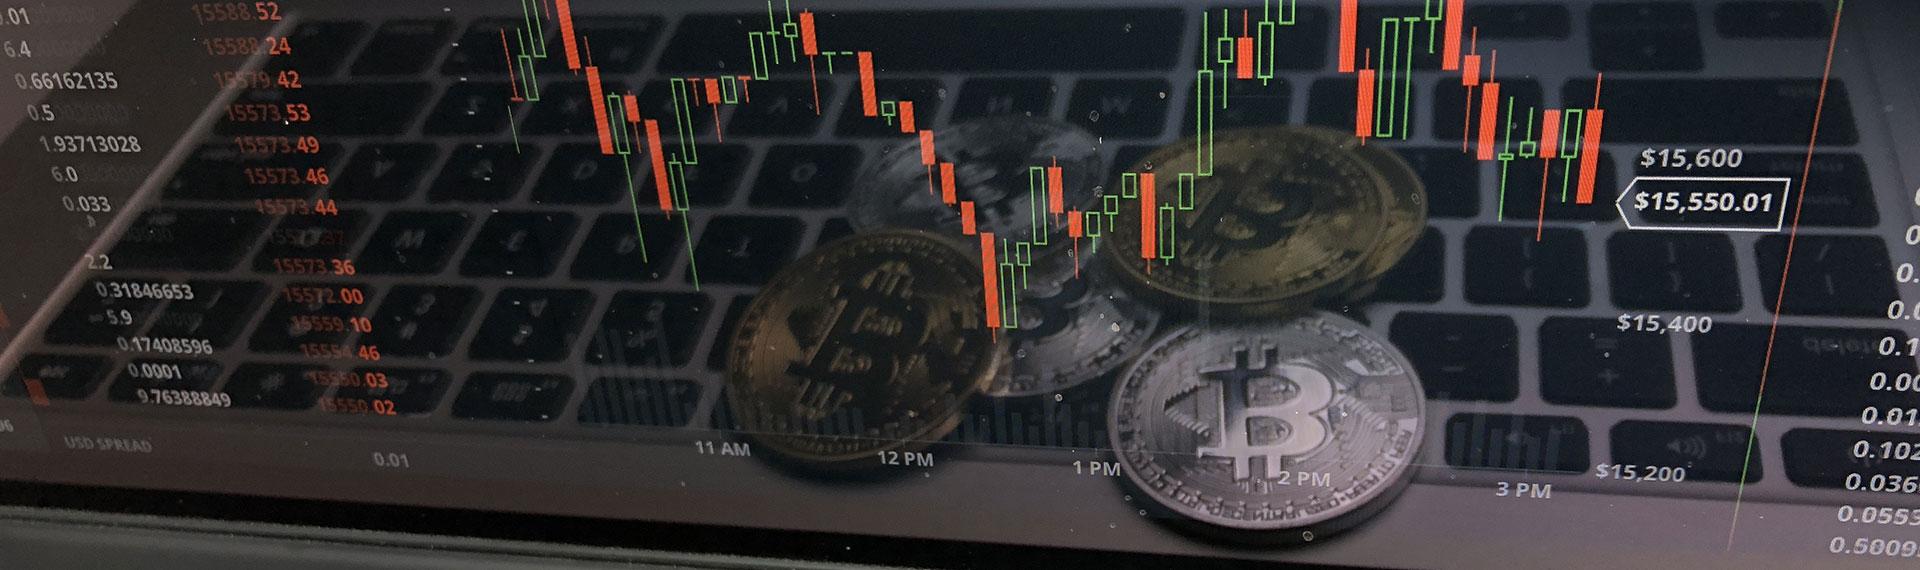 Quels avantages de recourir à des robots trading ?